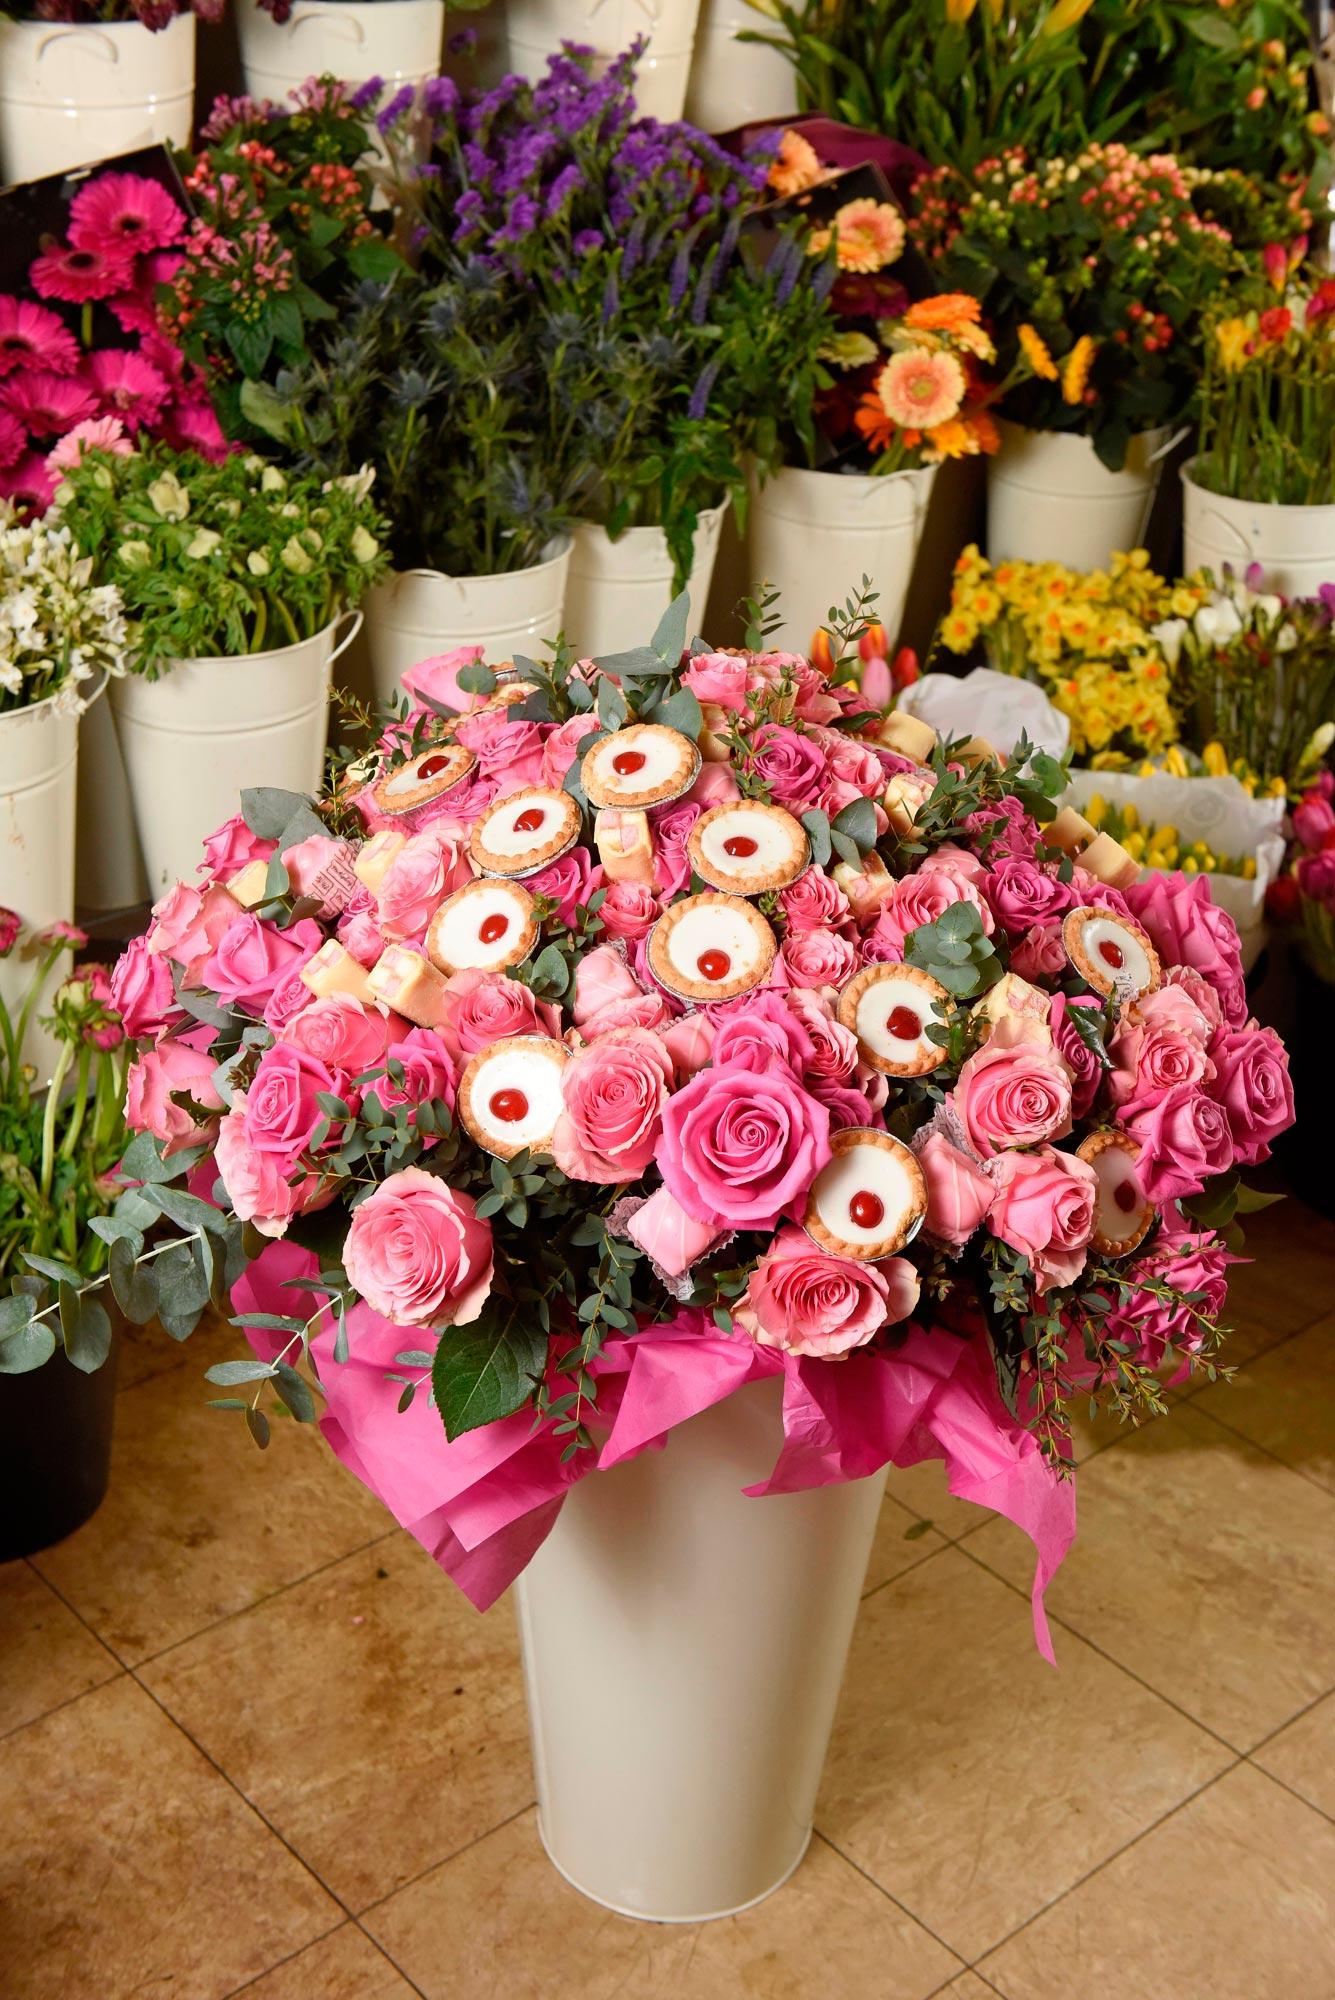 Mr-Kipling-Cake-Bouquet-3